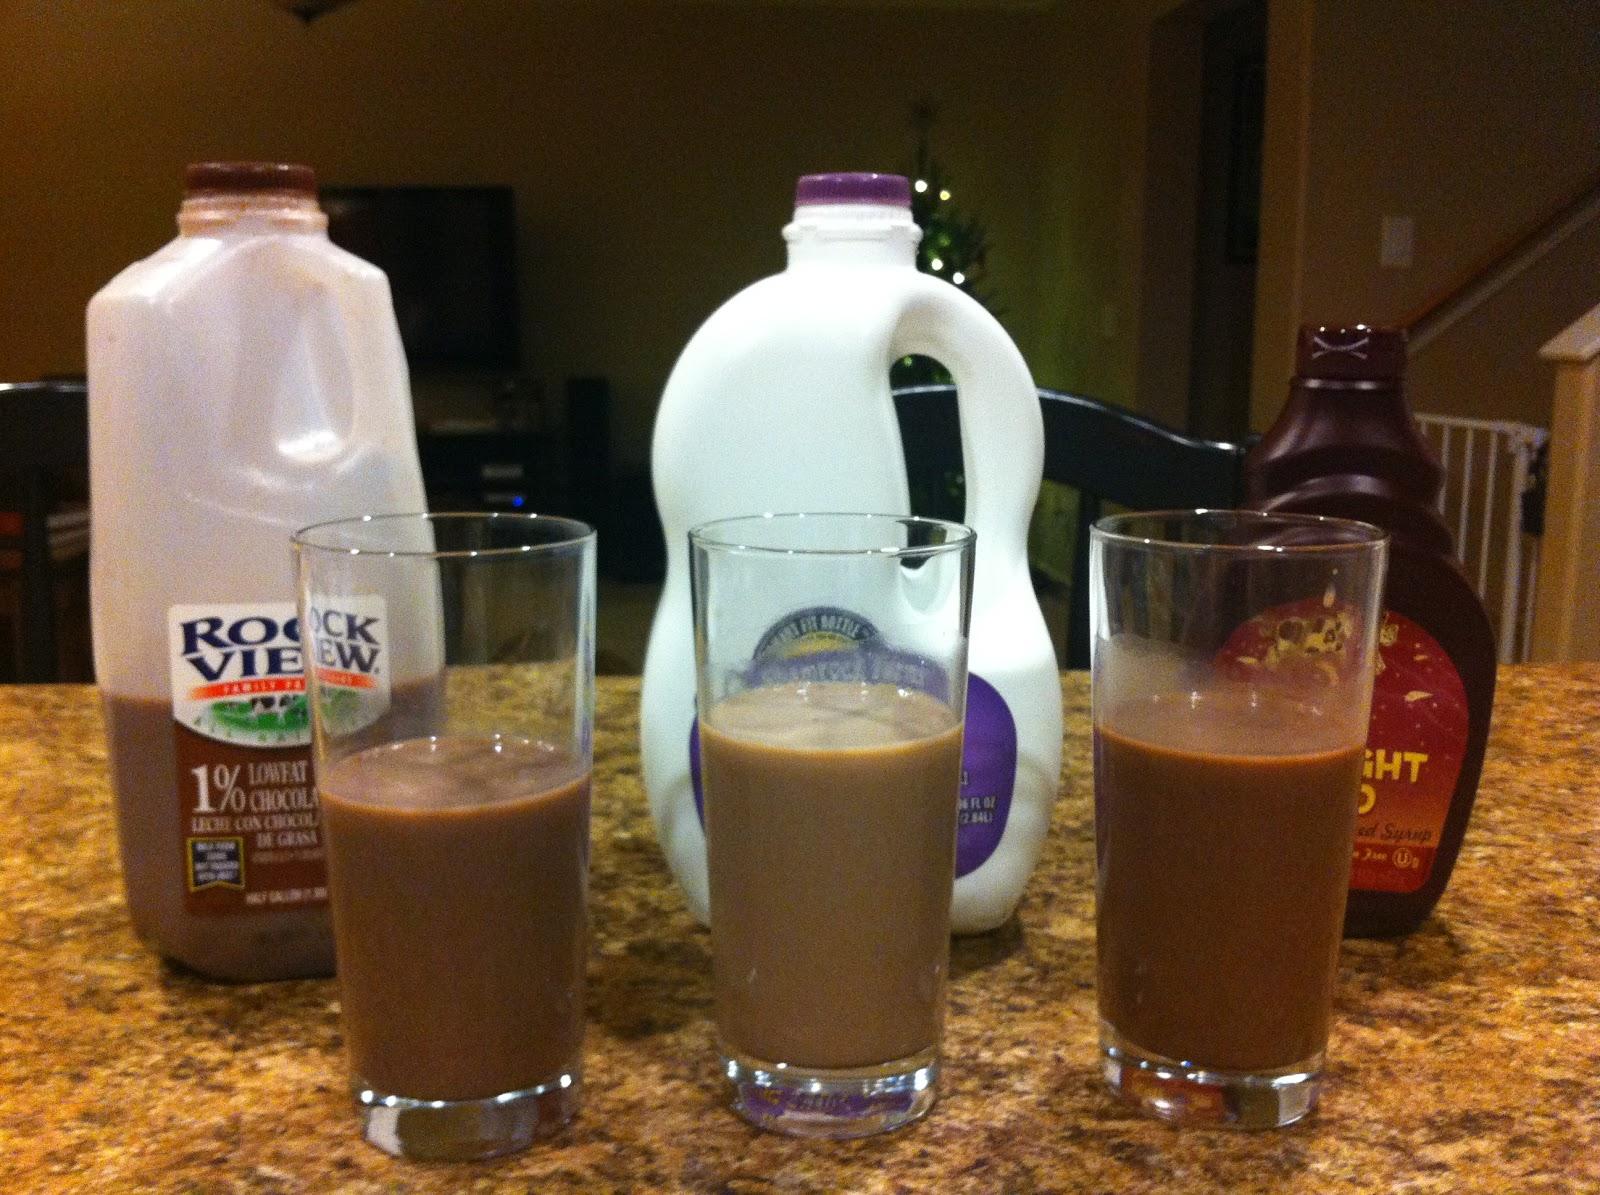 Roofresh: Milk, Chocolate Milk, Chocolate Chocolate Milk